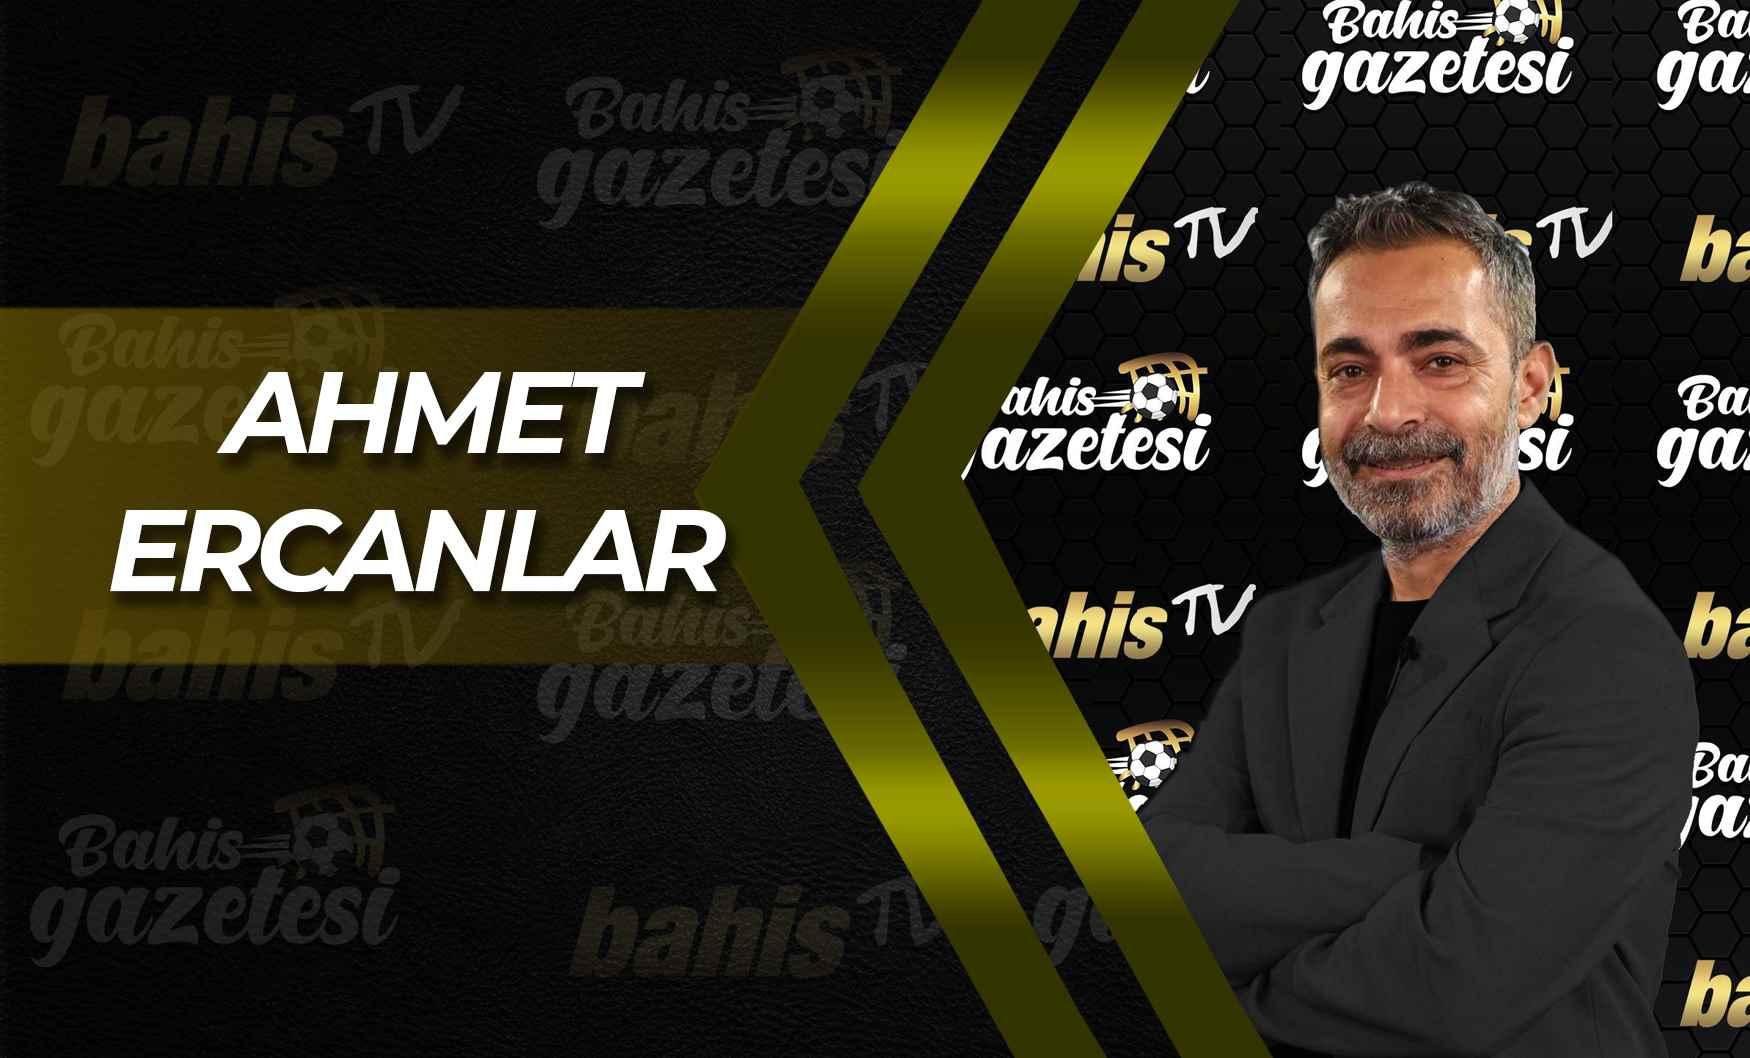 Ahmet Ercanlar